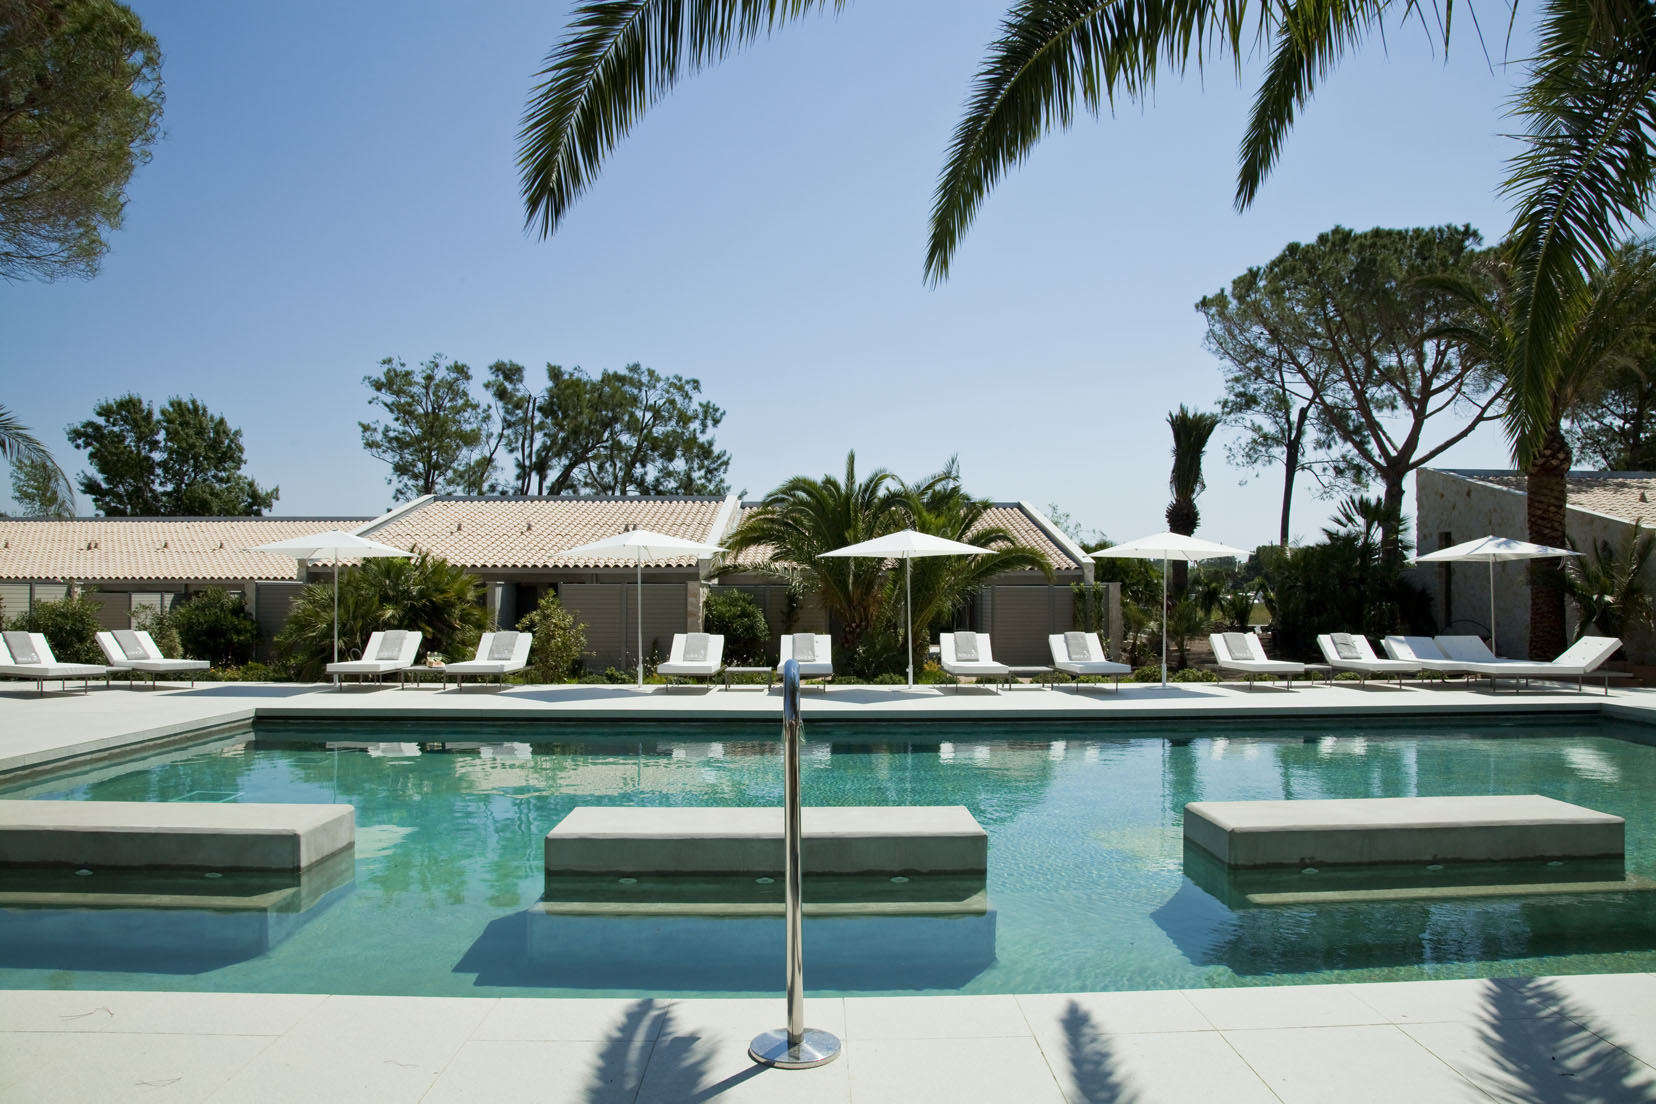 Sezz Saint Tropez - Pool_21